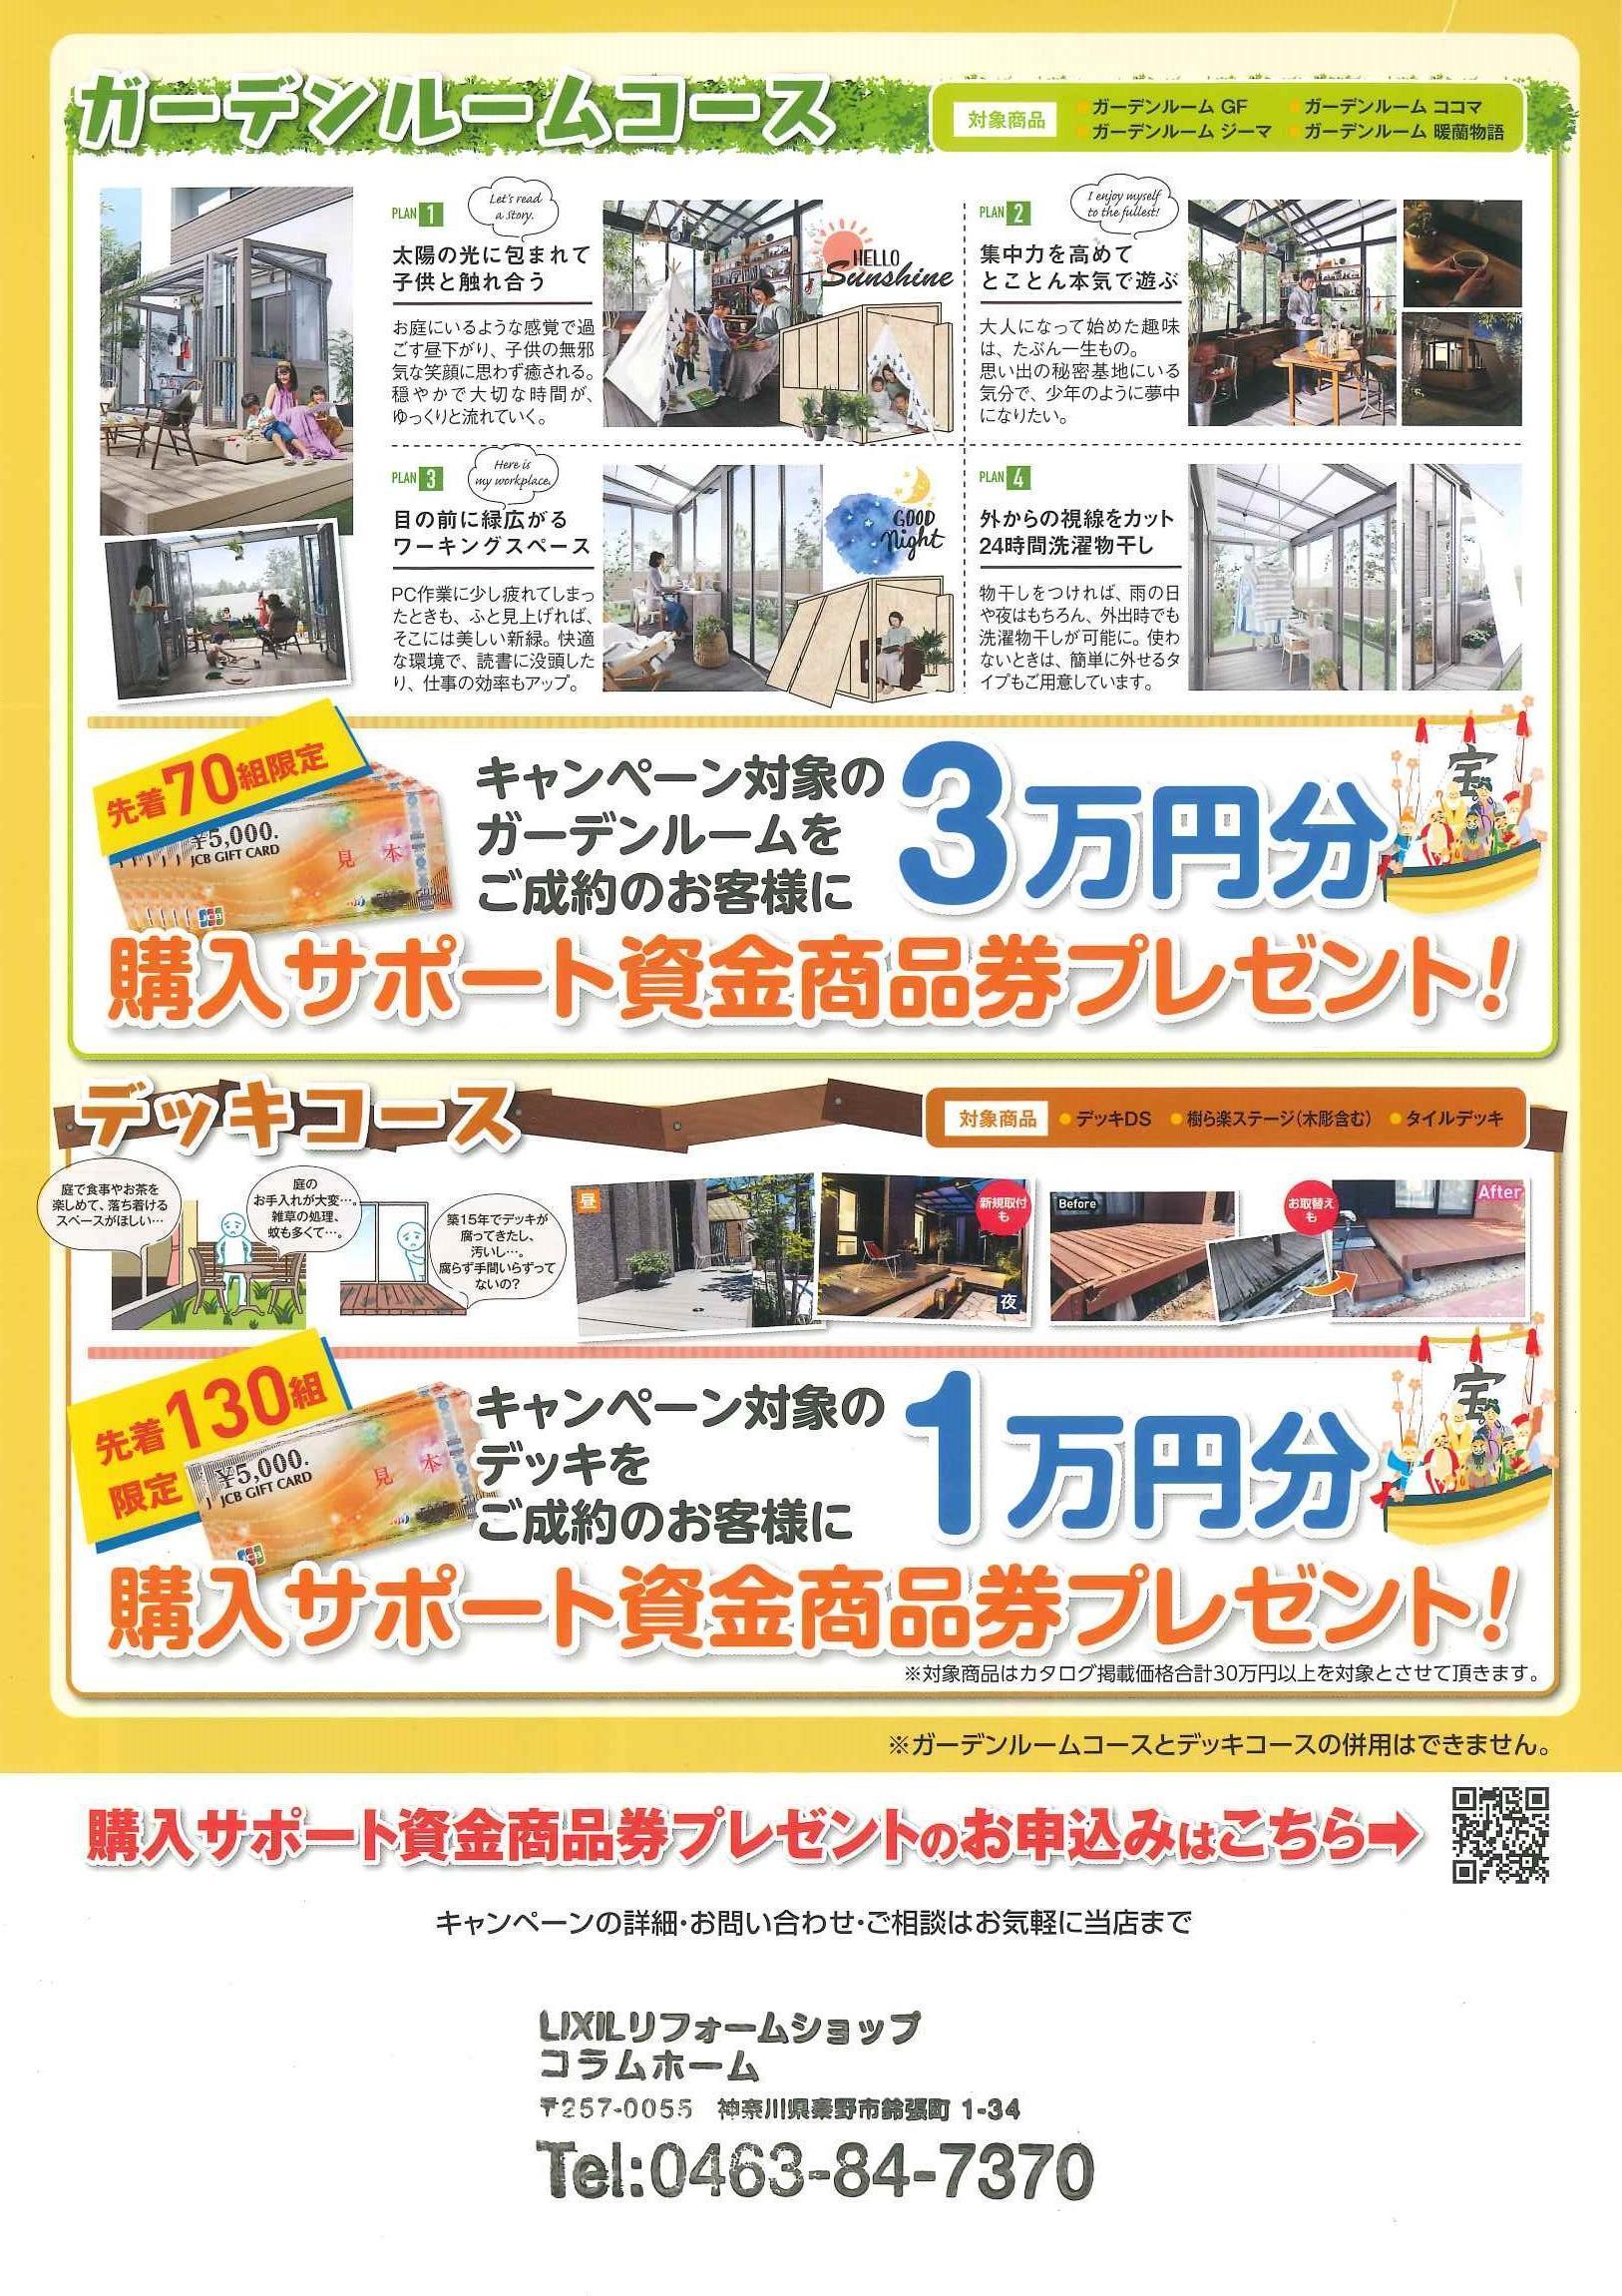 https://lixil-reformshop.jp/shop/SP00001107/photos/b823458fc09ab3856a7bdd8fcb0271f293627049.jpg